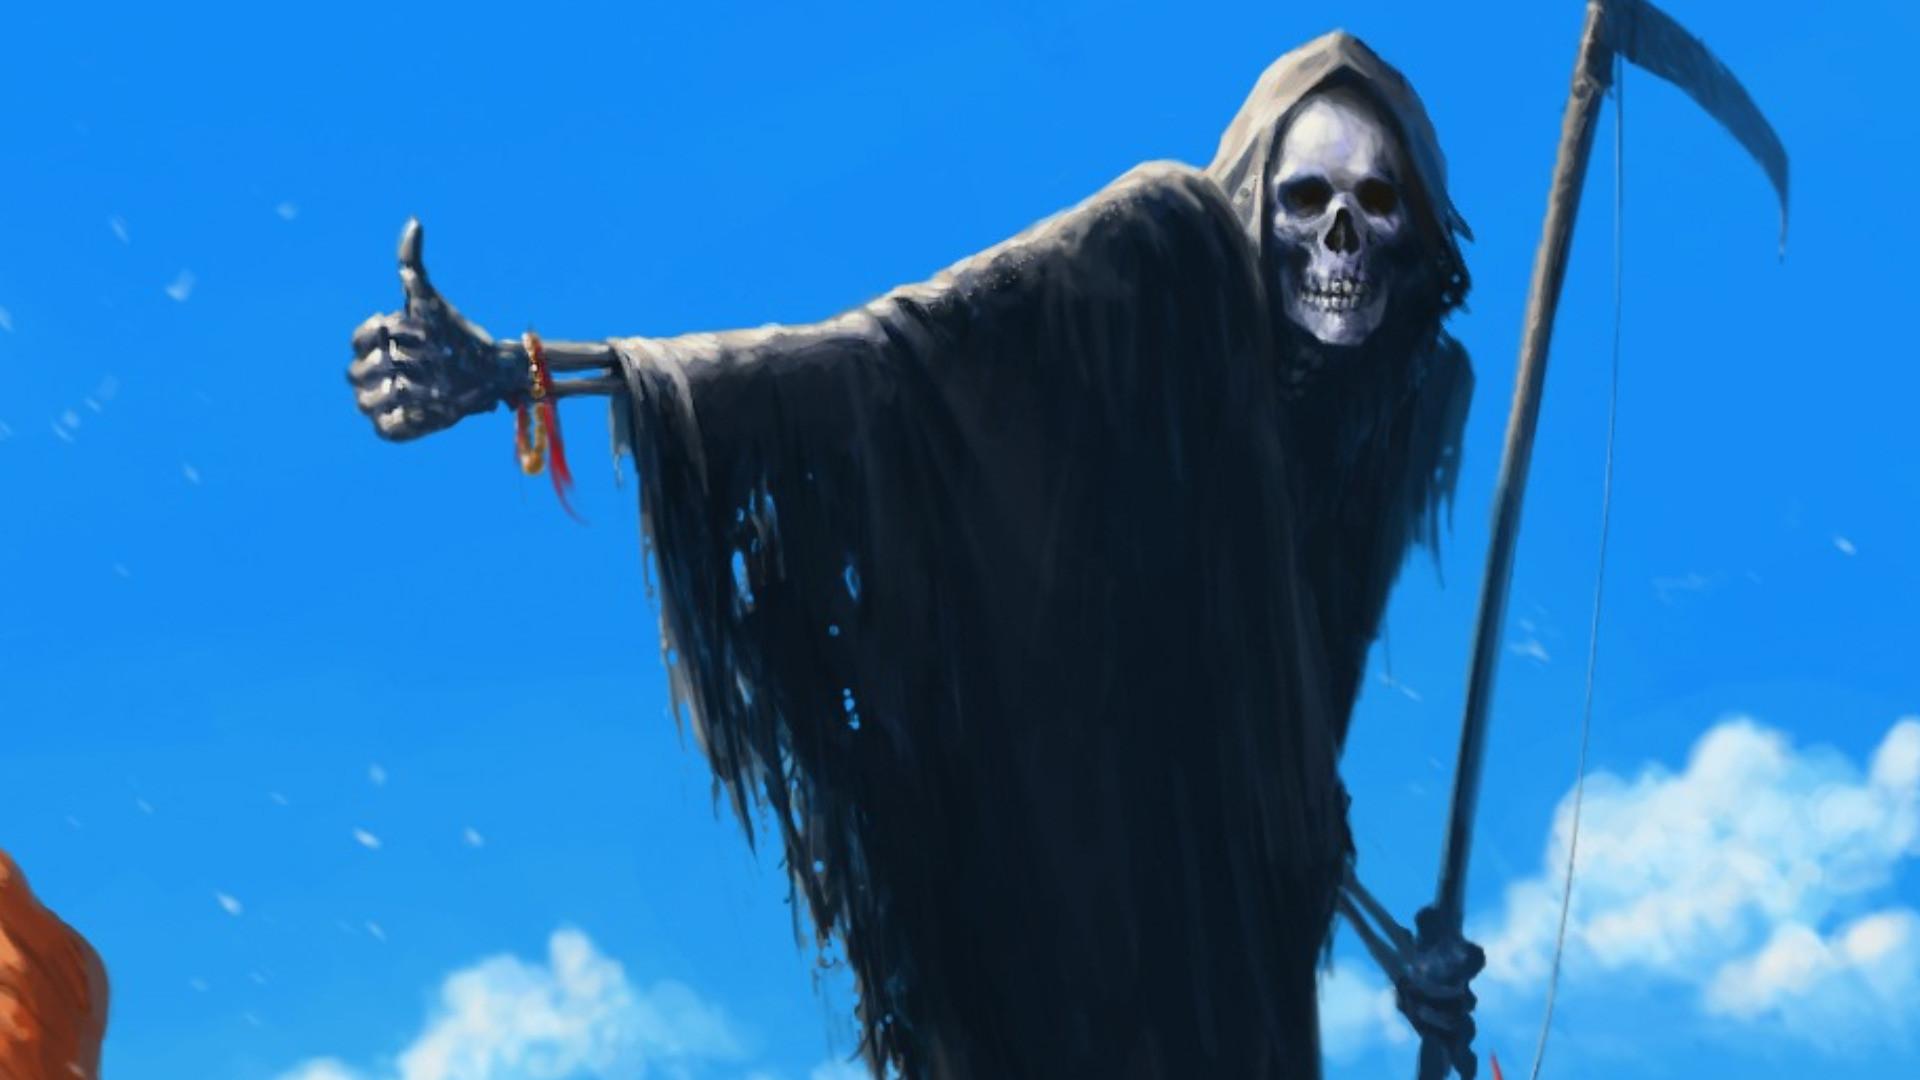 Dark Grim Reaper Horror Skeletons Skull Creepy Wallpaper At Dark Wallpapers